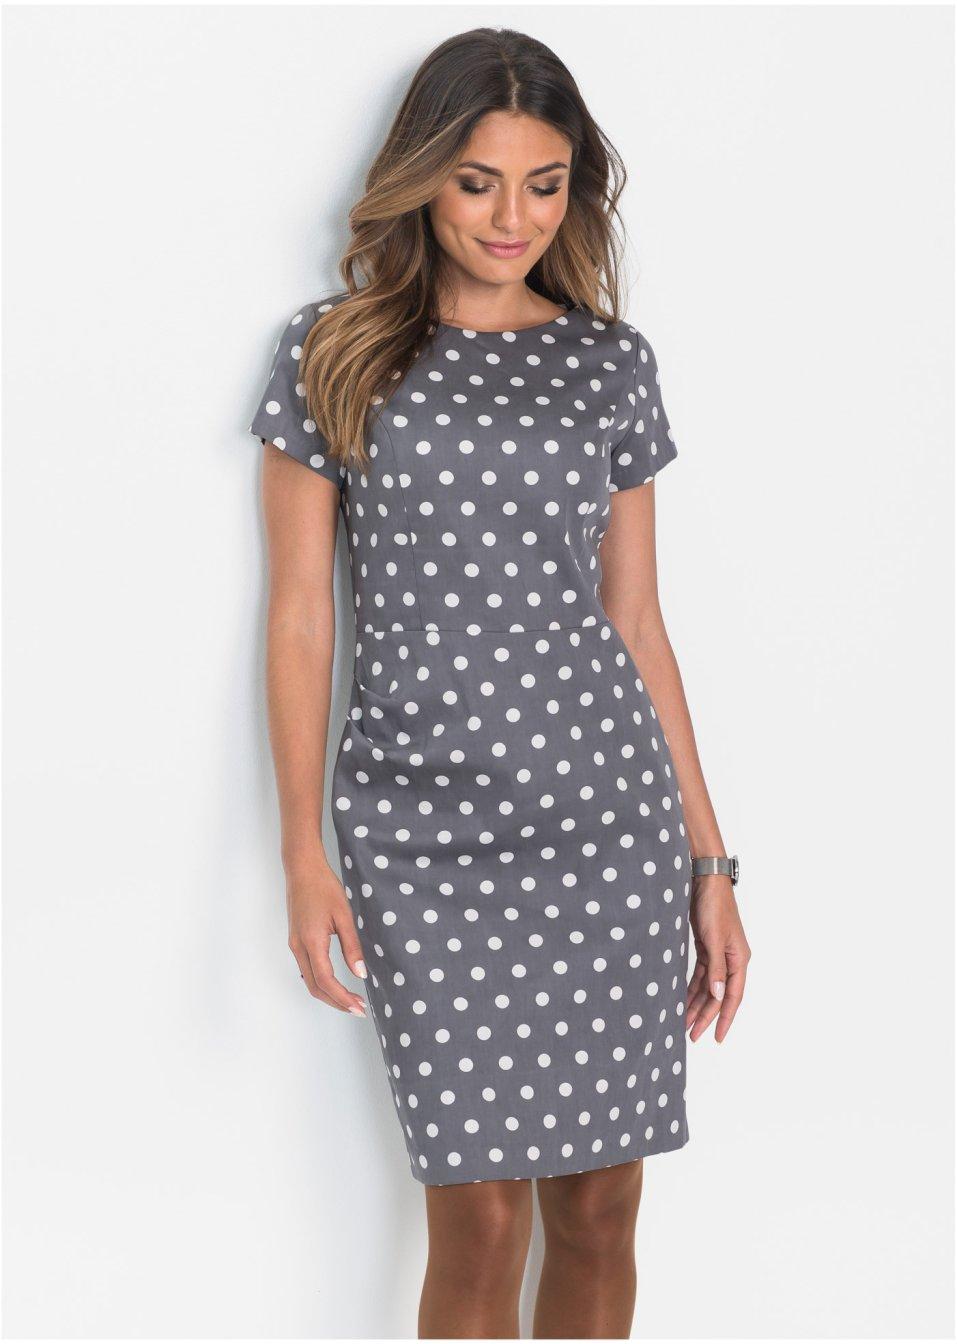 Kleid grau/weiss gepunktet - Damen - - bonprix.ch